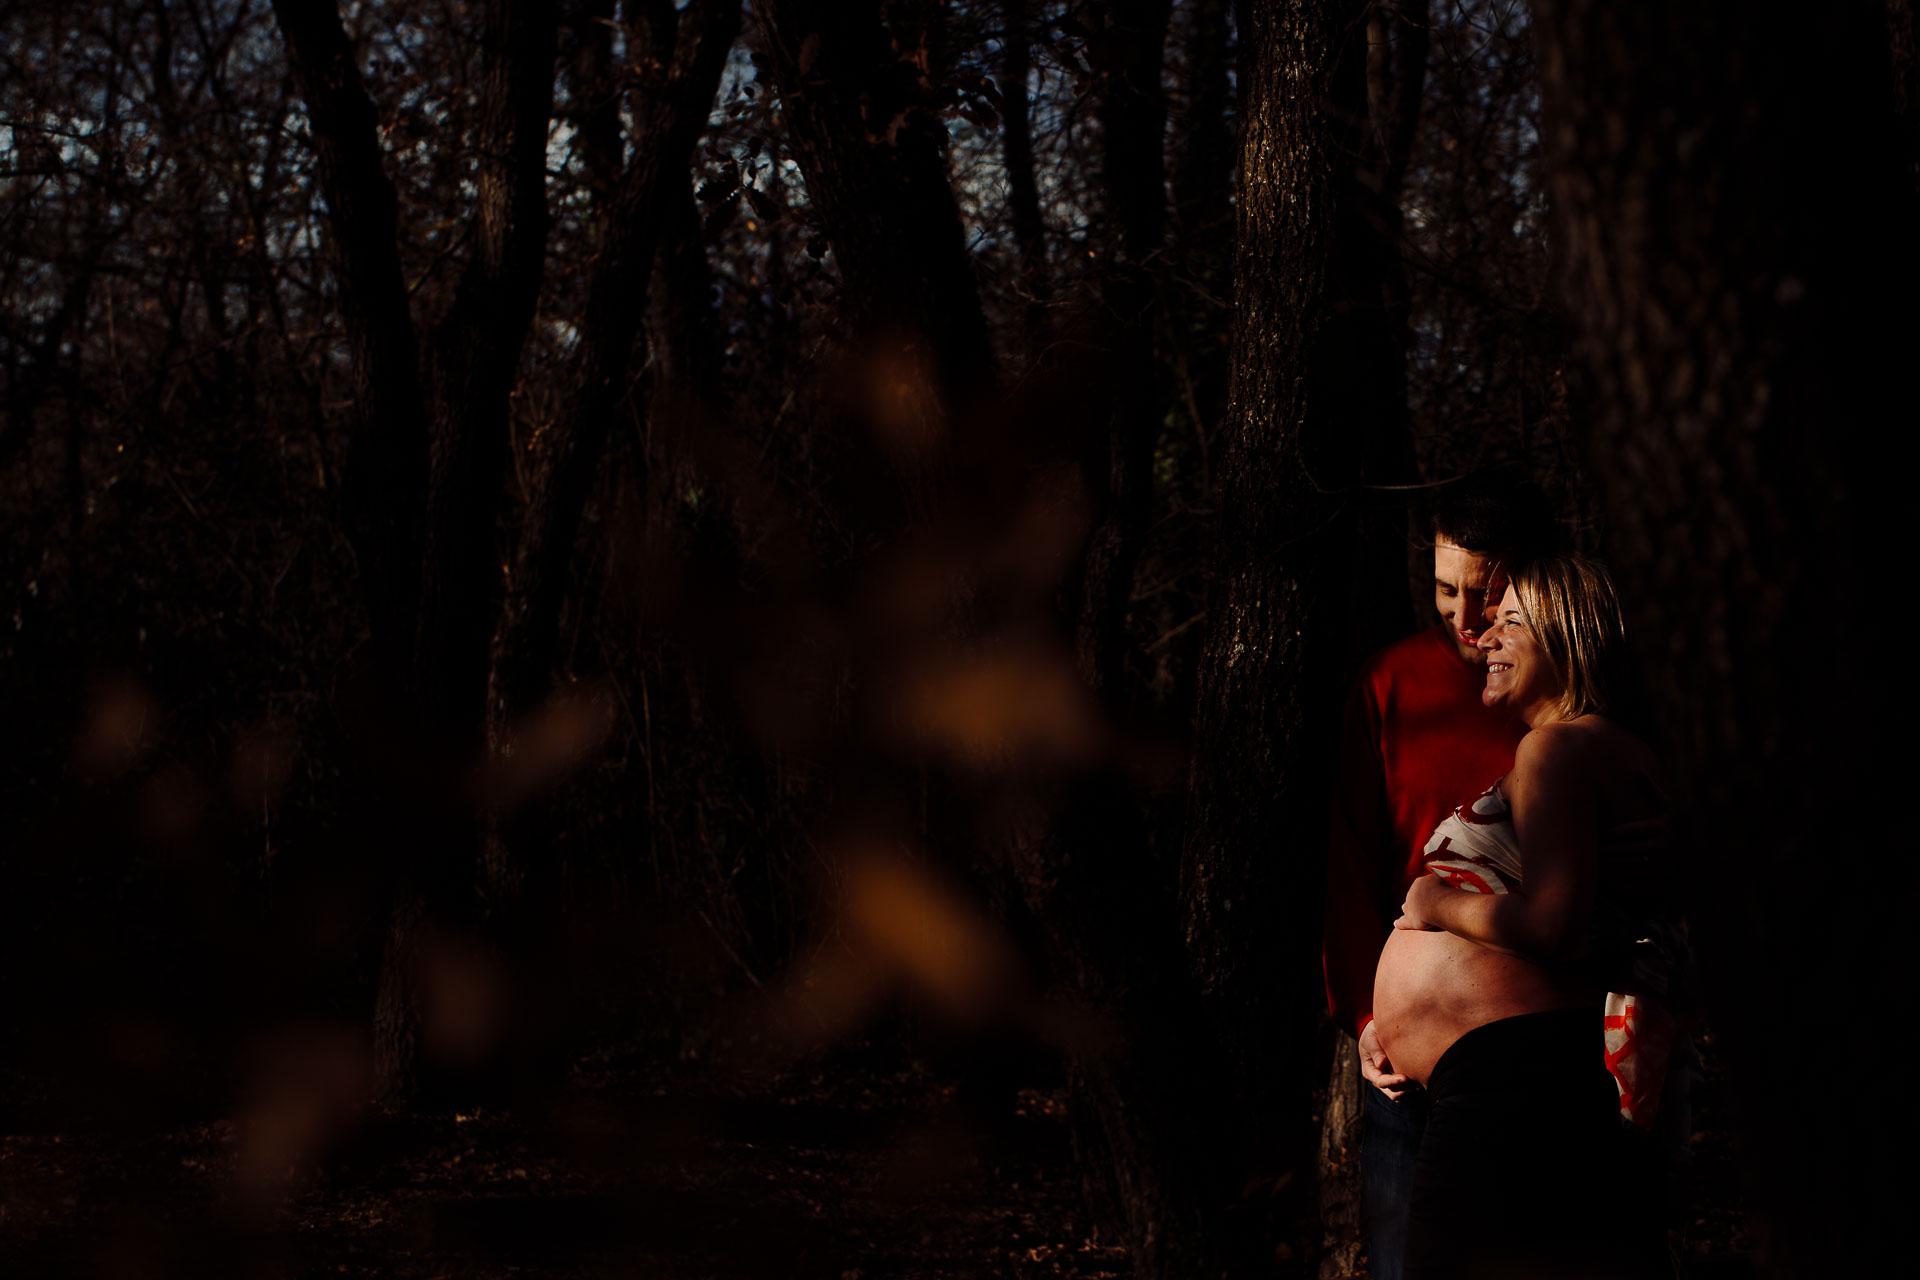 sesion fotos embarazada madrid